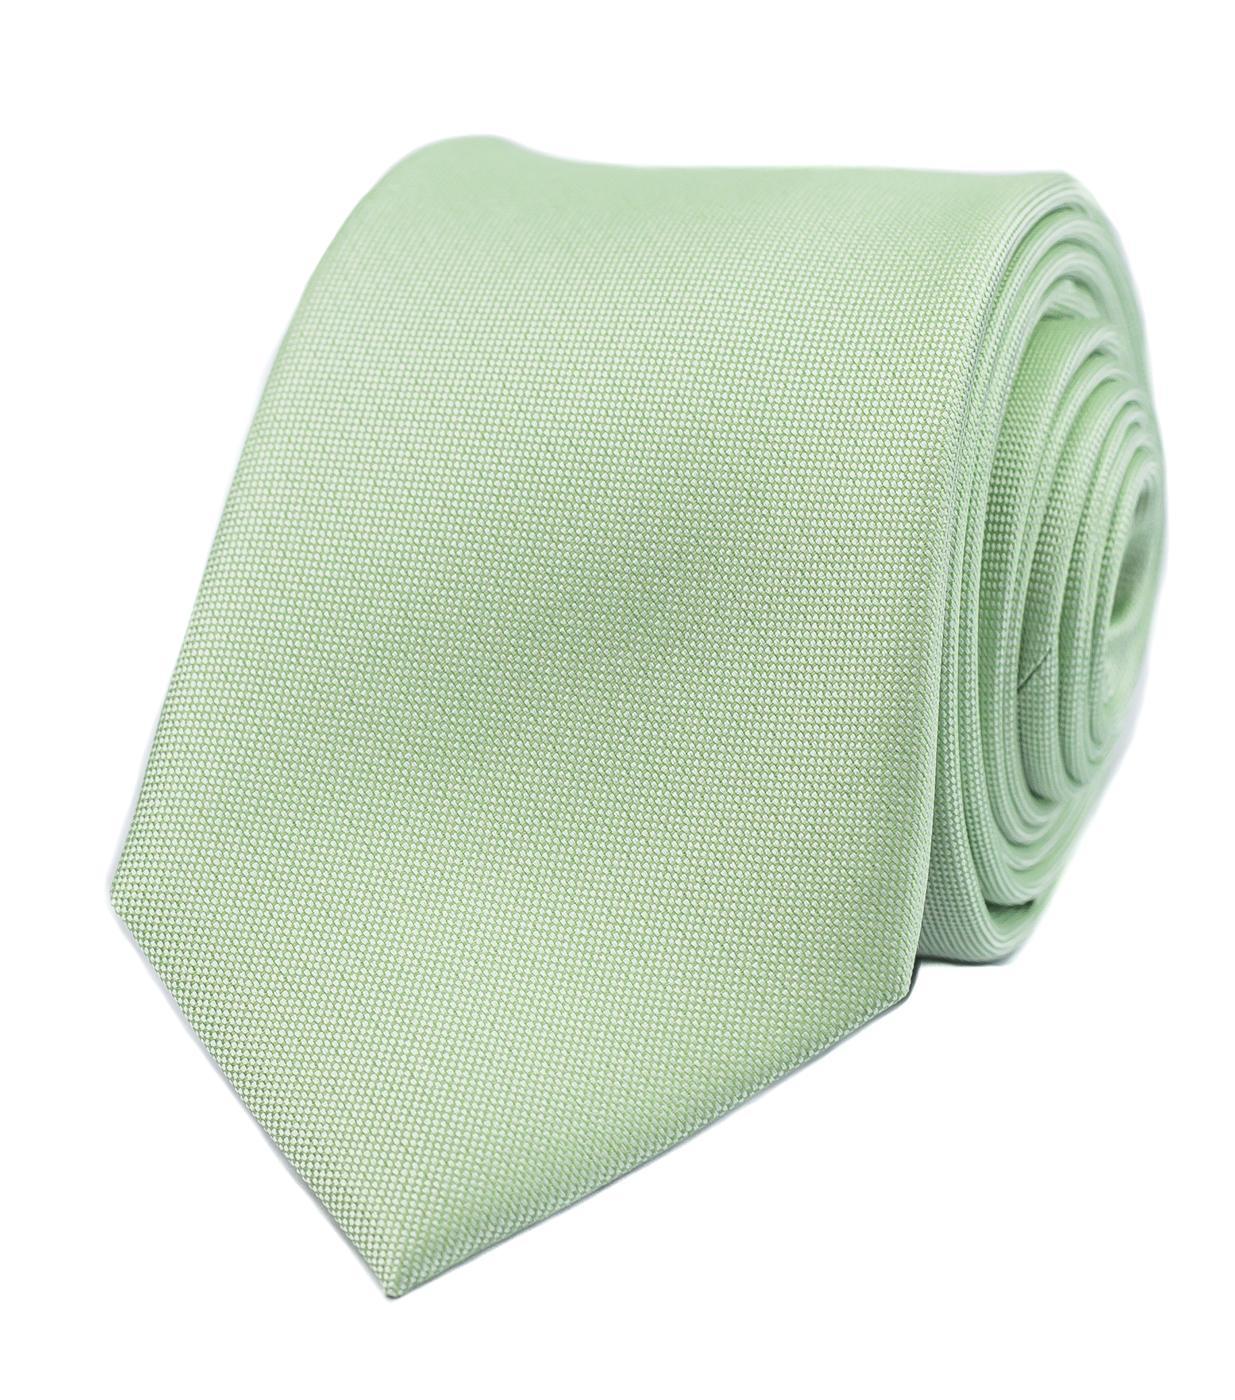 Mint hedvábná kravata - Obrázok č. 1